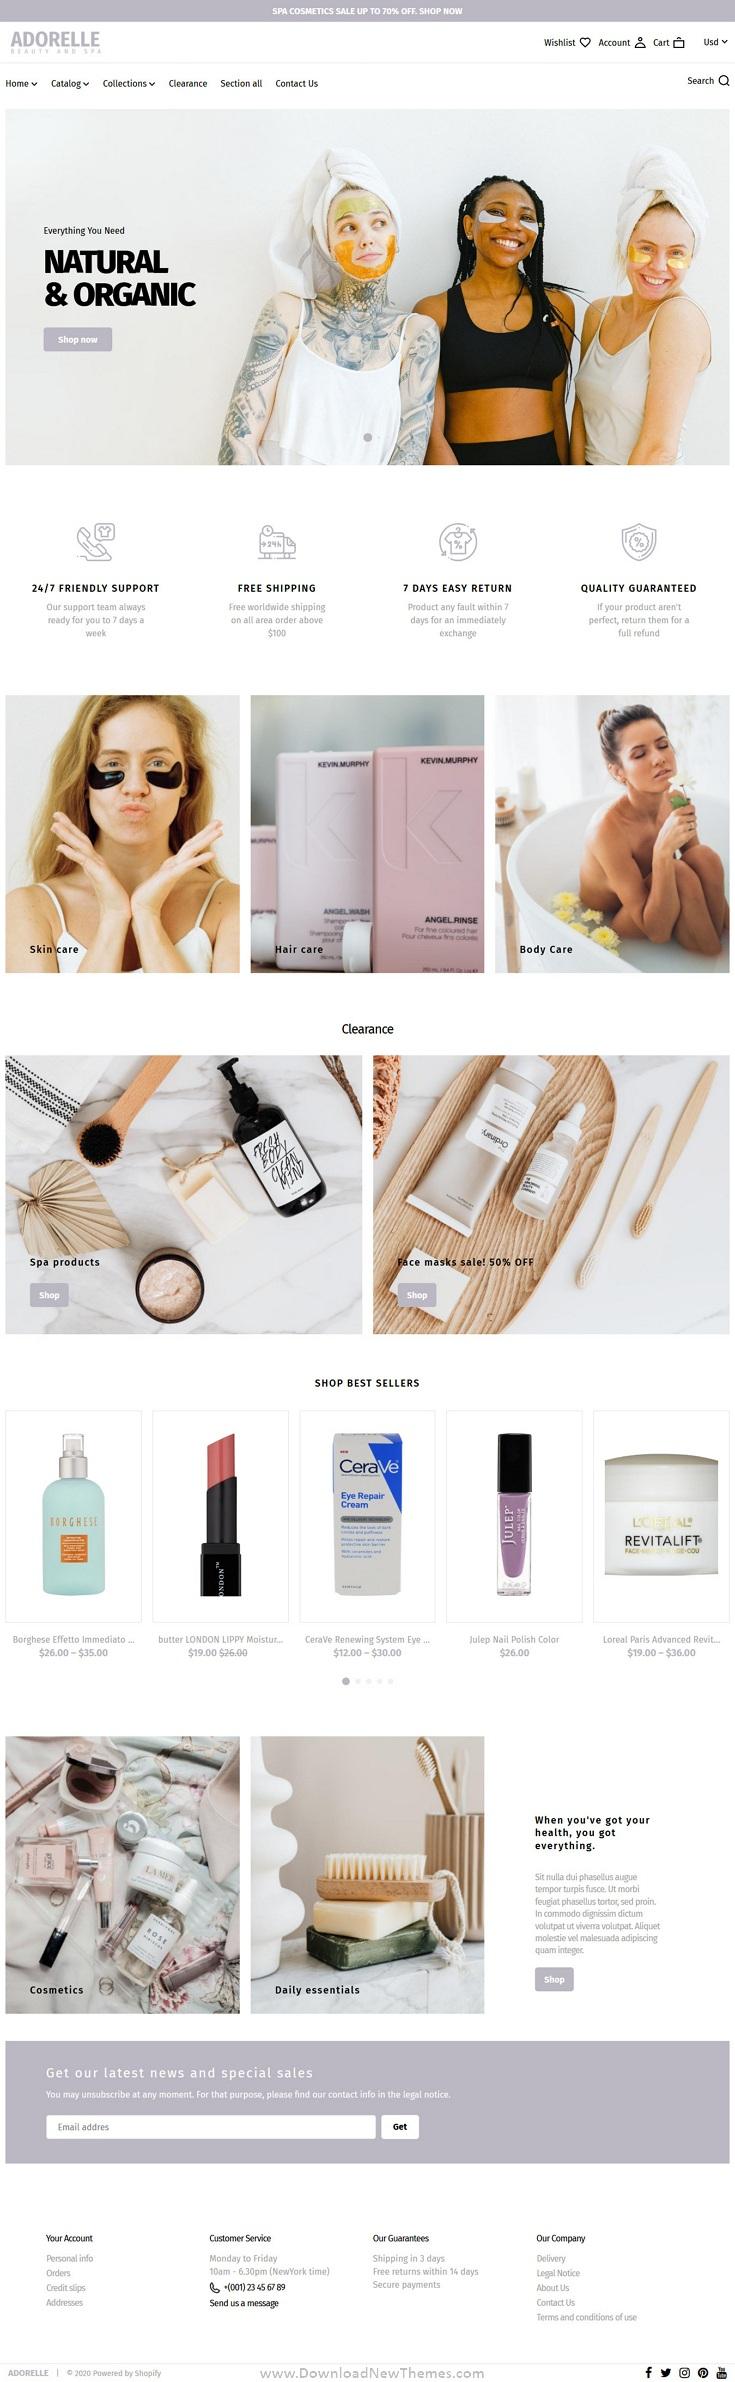 Beauty Salon and Spa Shopify Theme